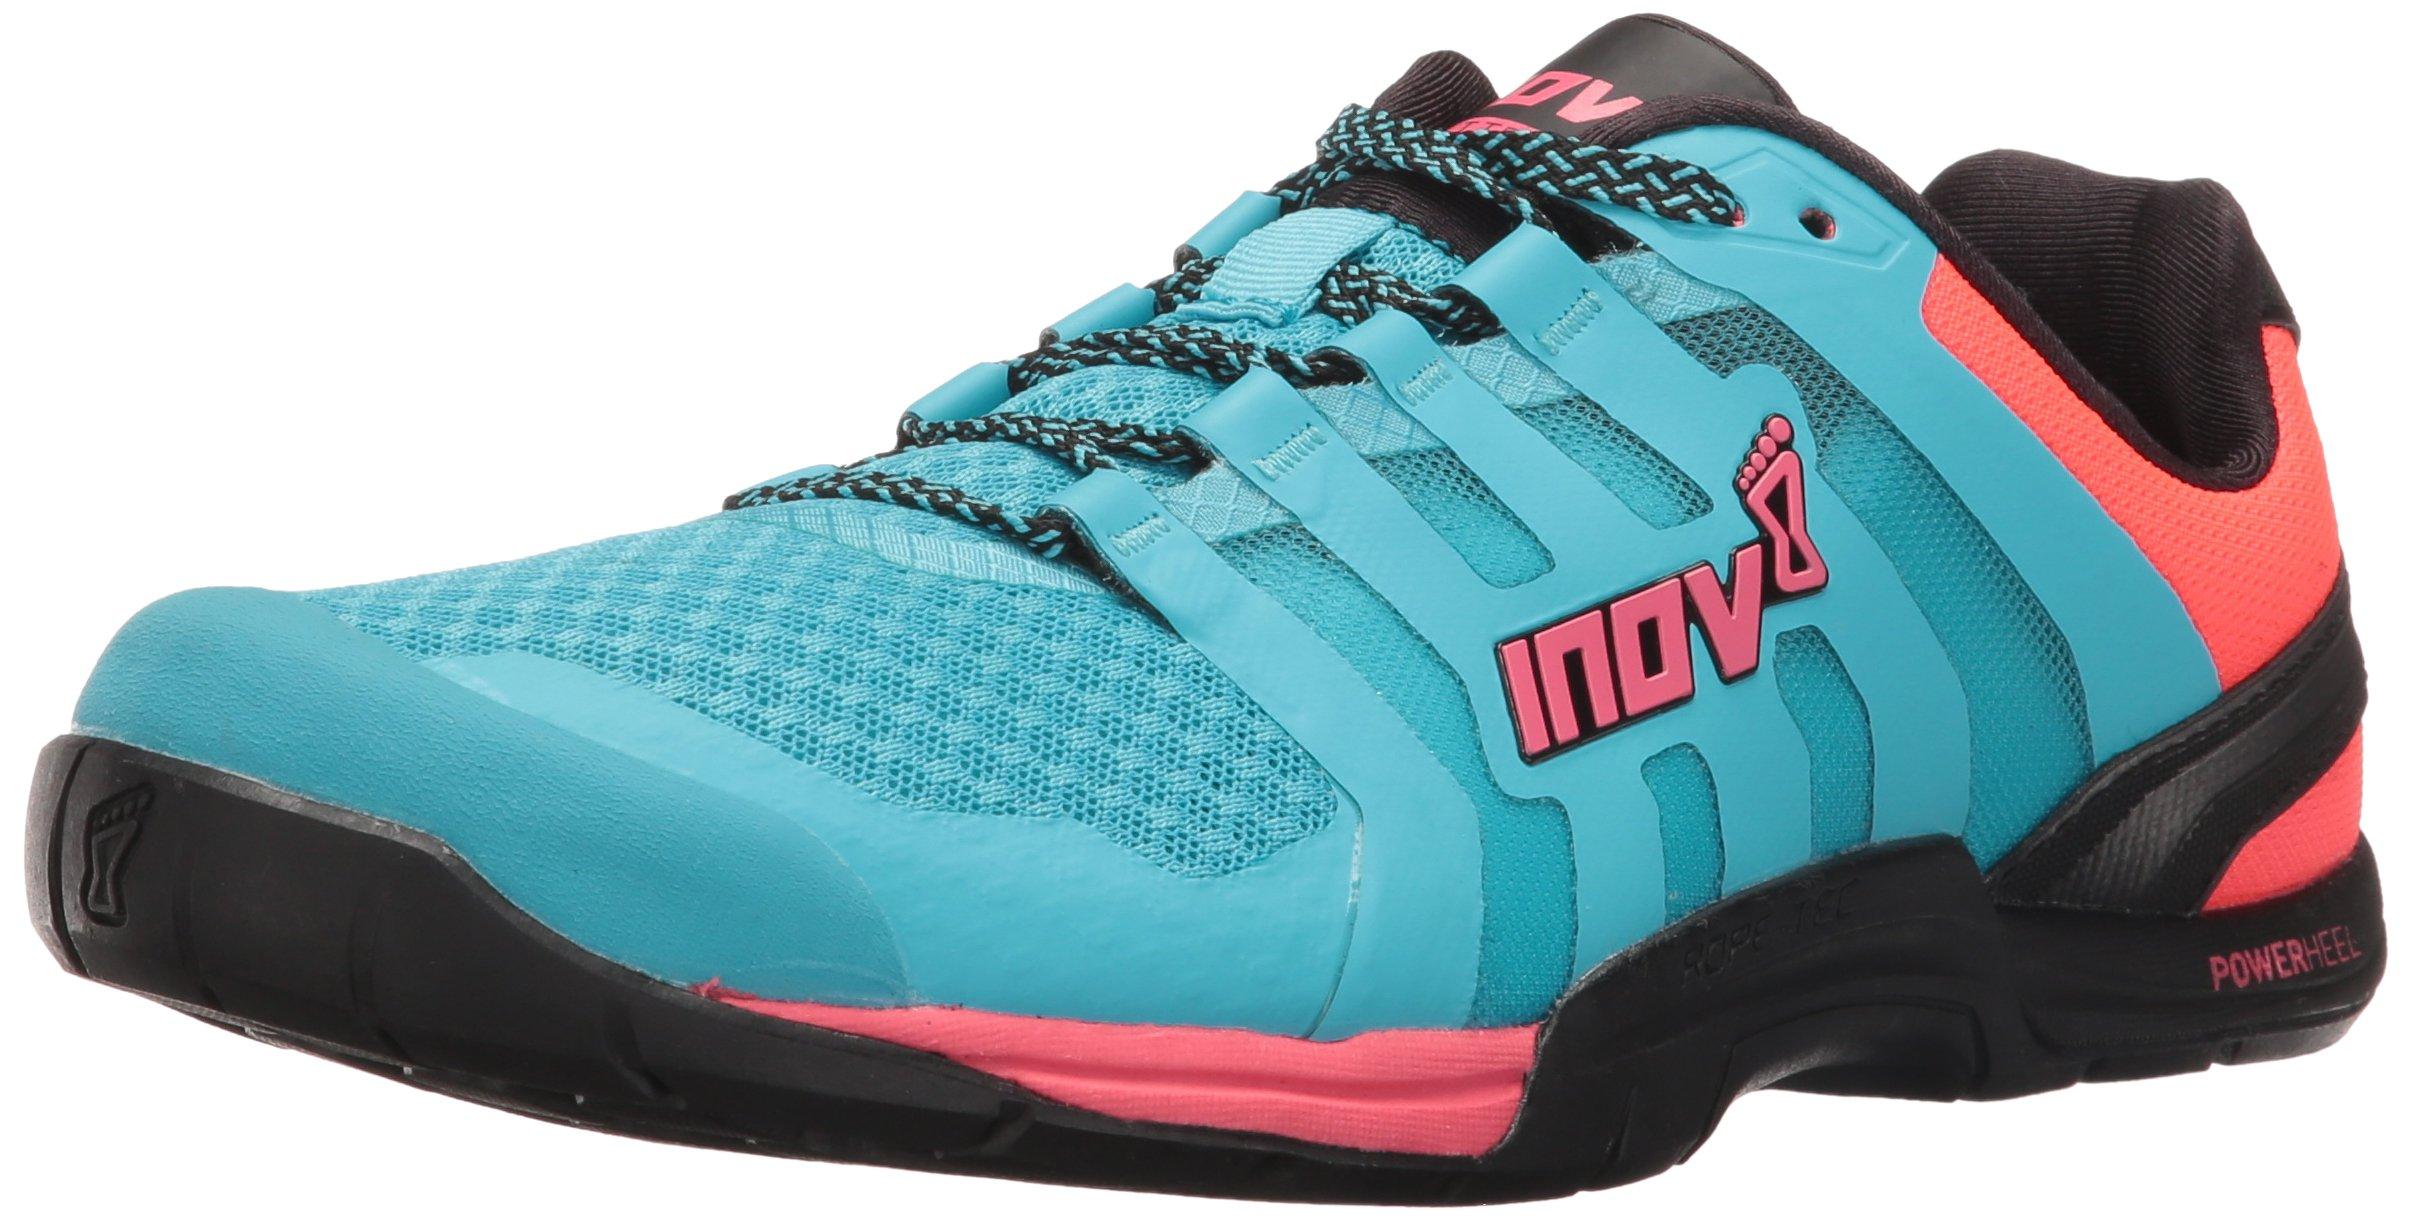 Inov-8 Women's F-LITE 235 V2 Cross-Trainer Shoe, Blue/Black/Neon Pink, 5.5 E US